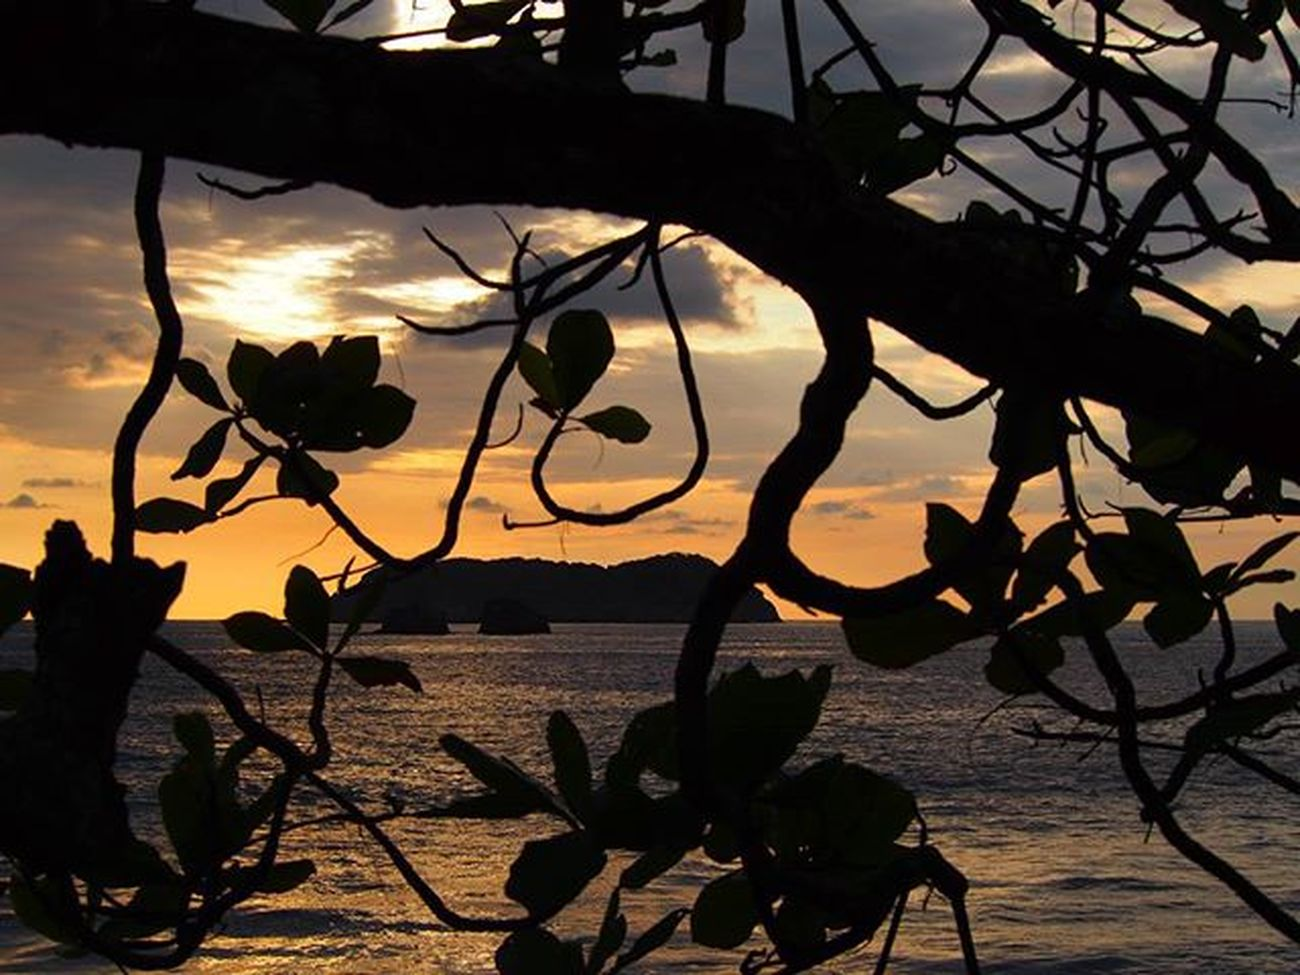 Sunset from behind a tree on the beach in Manuel Antonio, Costa Rica ------------------------------------------------------ Manuelantonio Costaricagram Costarica Costarica2015 Sunsets Sunset_madness Sunrise_sunsets_aroundworld Gadventurestour Gadventures Island Islands Centralamerica Clouds Cloudscape Cloudporn Silouette Oceanside Ocean Travelling Travelgram Instatravel Takemeback Olympus Beach Beachlife instagram instapic landscape natgeotravel